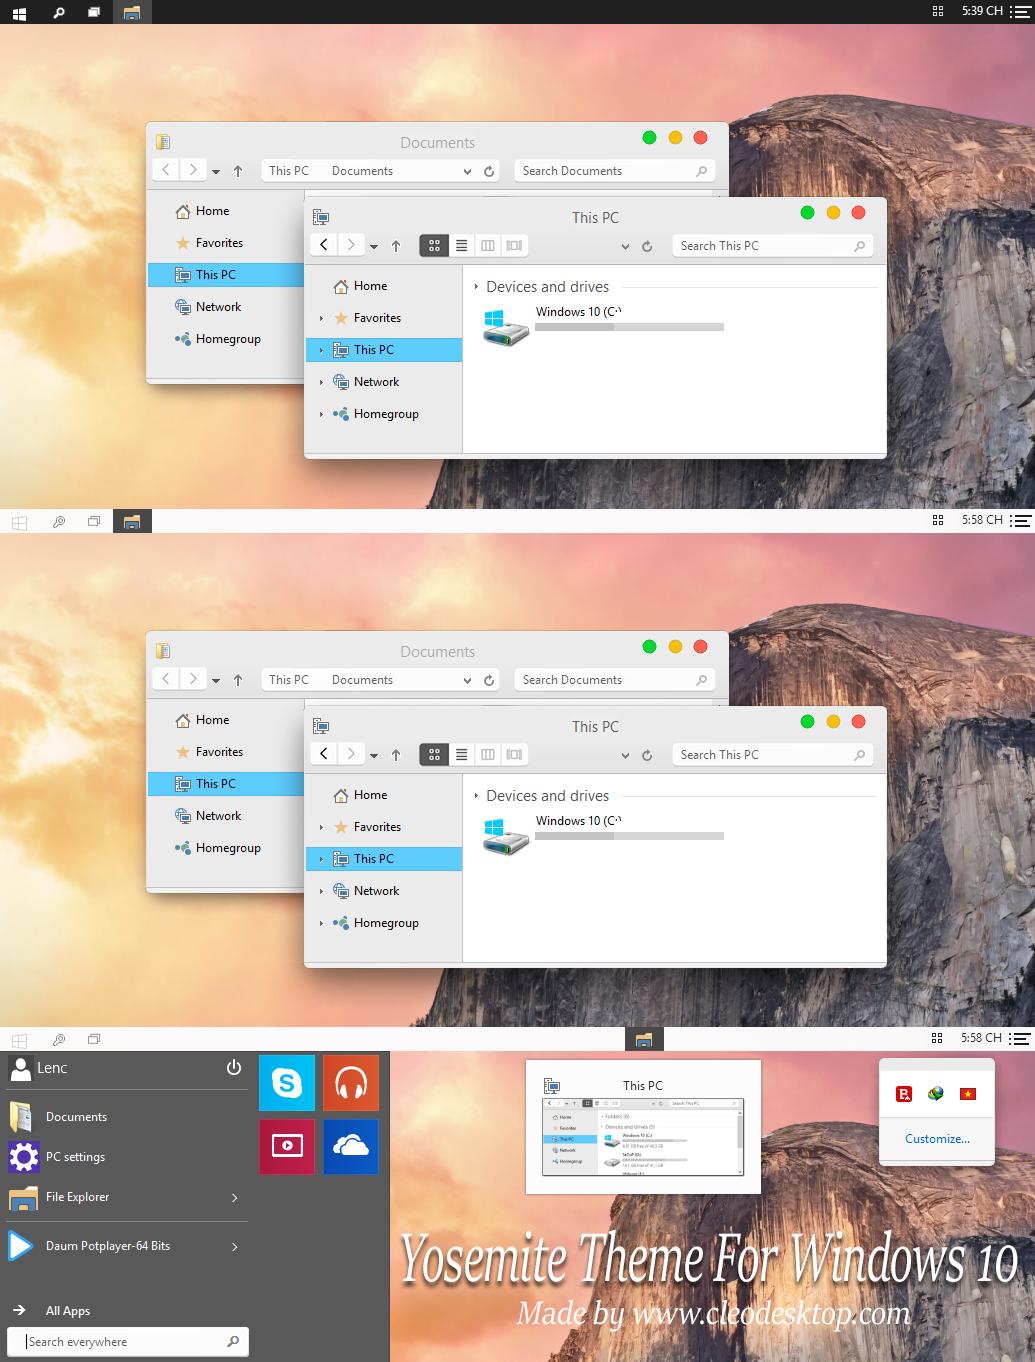 Mac yosemite theme for windows 10